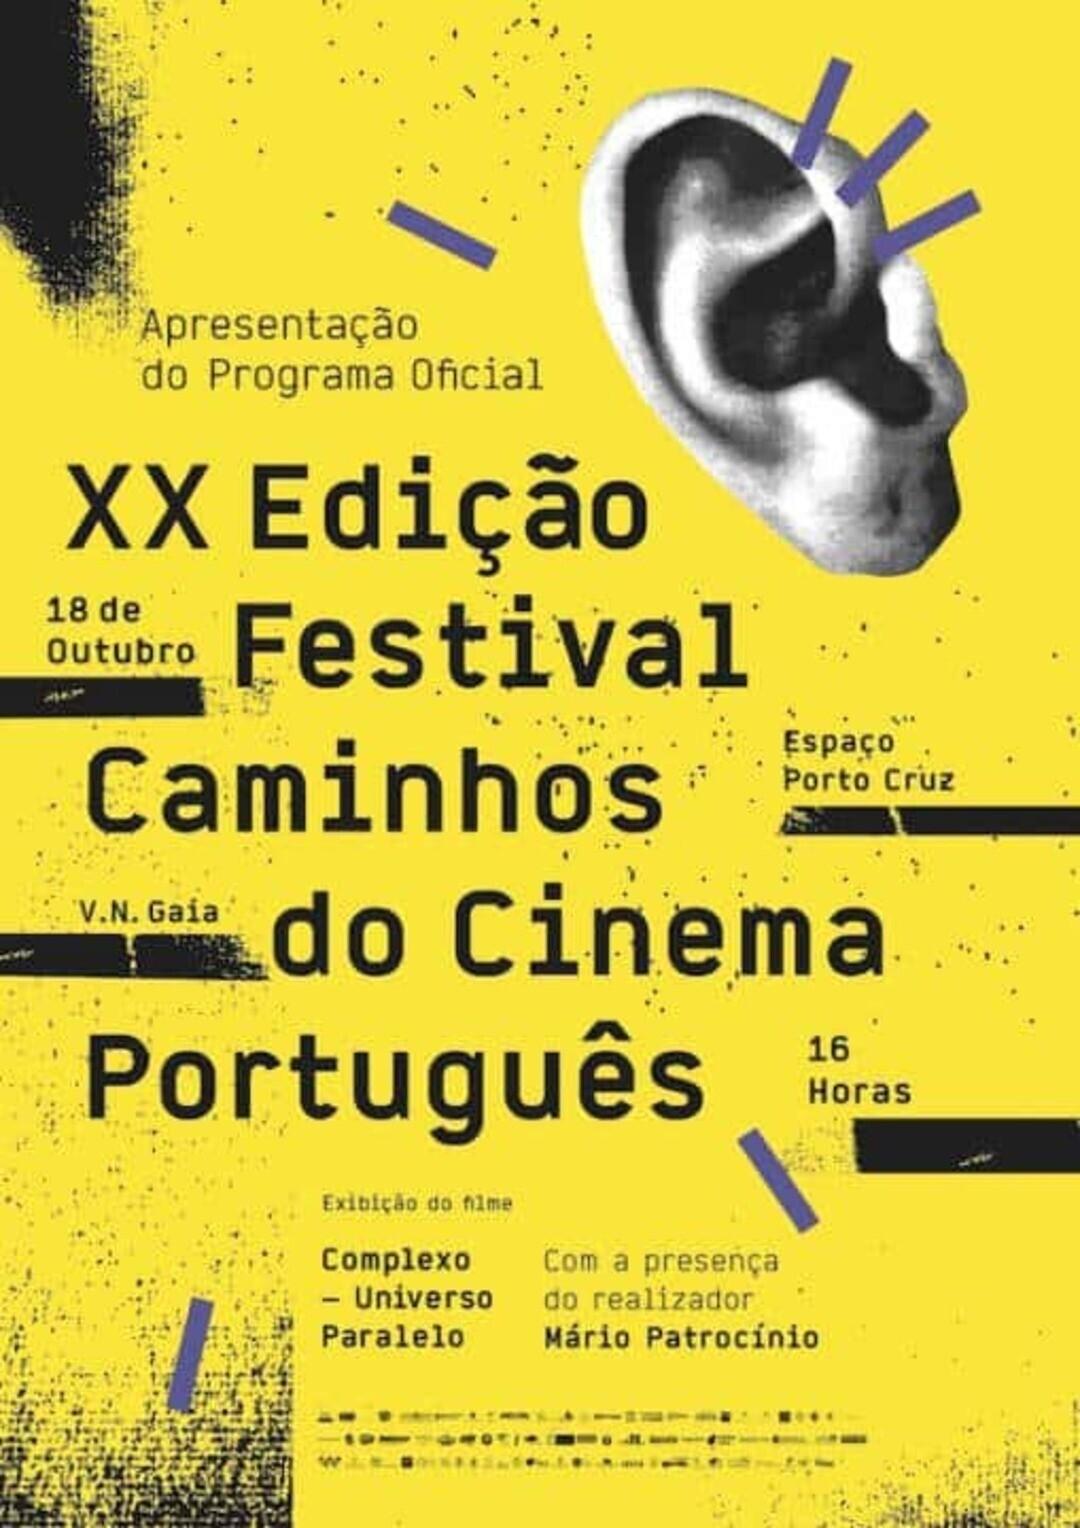 cartaz_porto_cruz.jpg